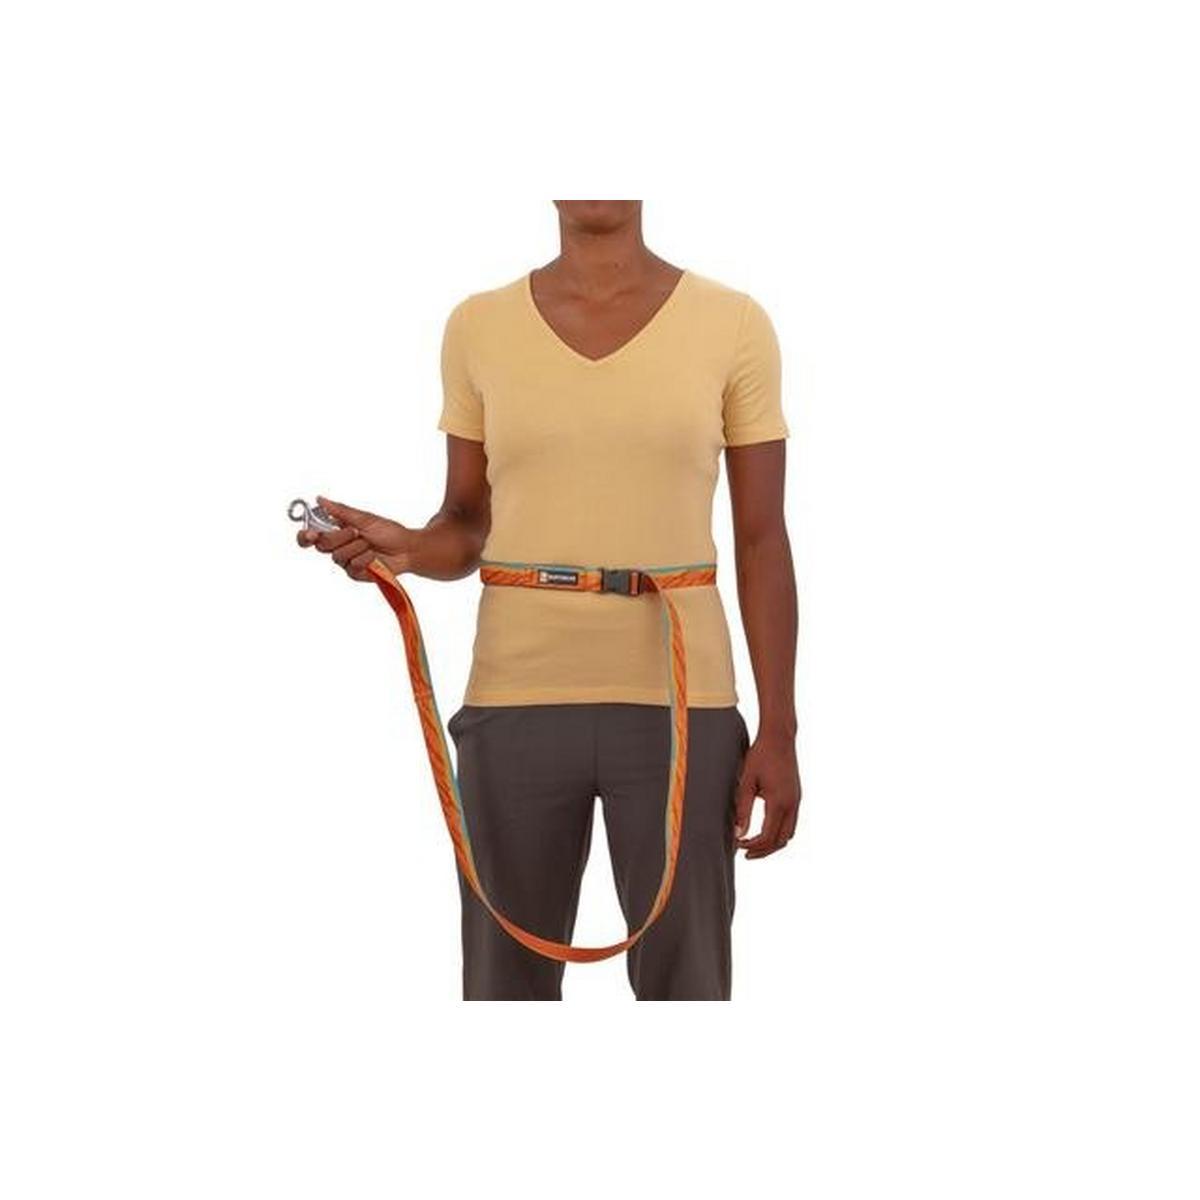 Ruffwear Flat Out Adjustable Dog Leash - Fall Mountains